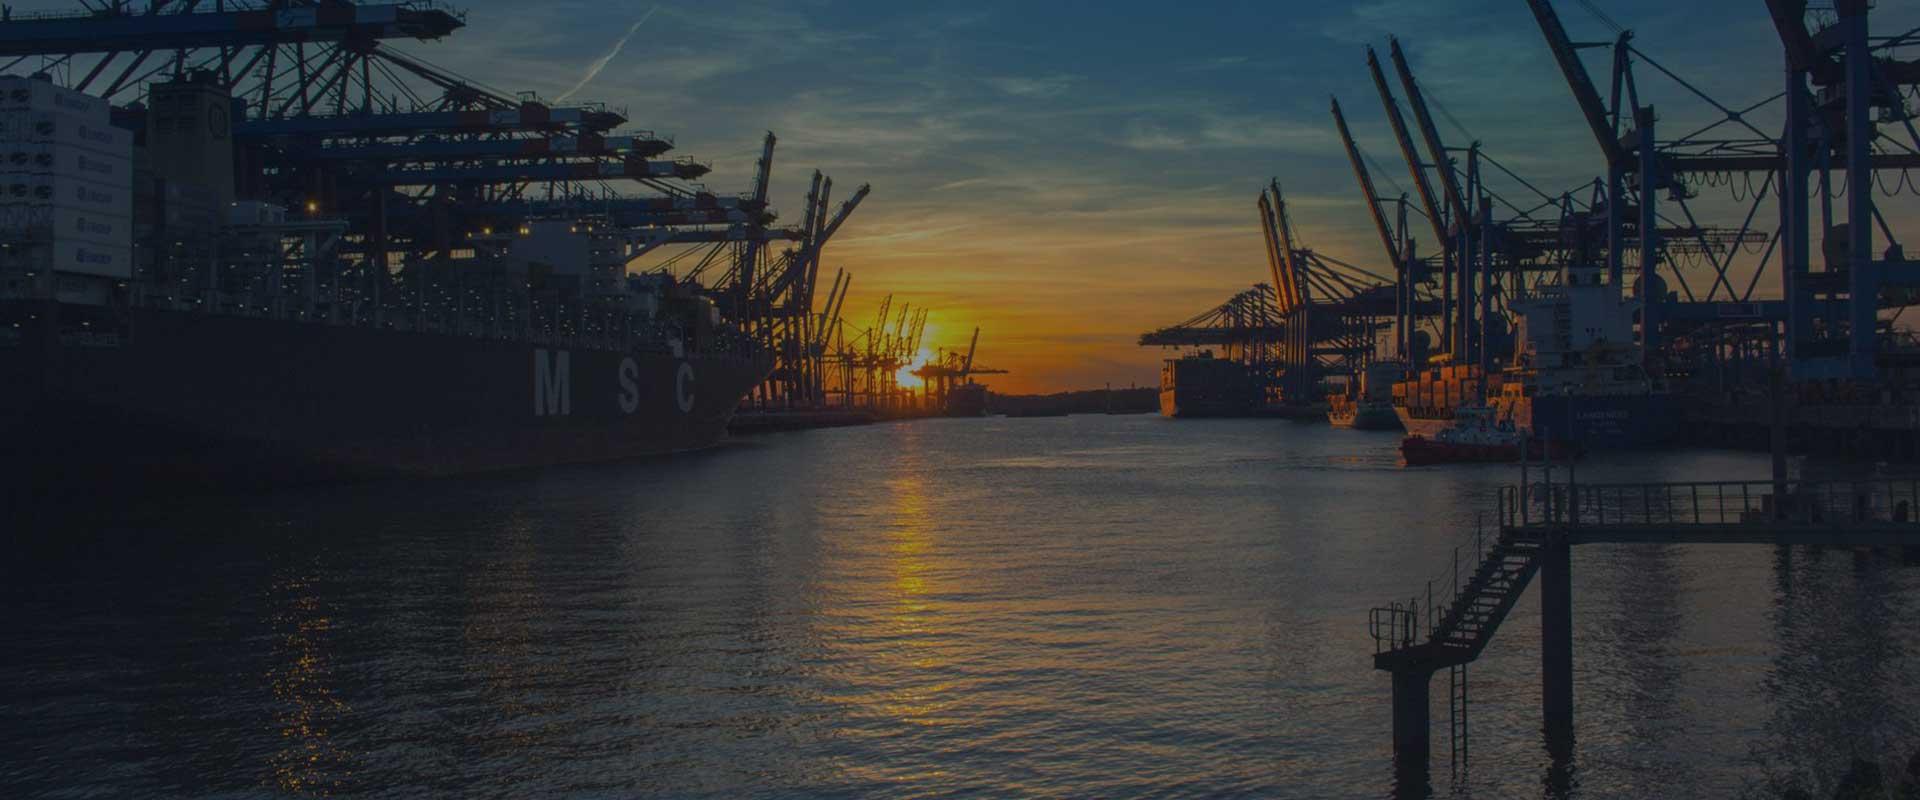 Sea Export Pedraza Customhouse Brokers logo